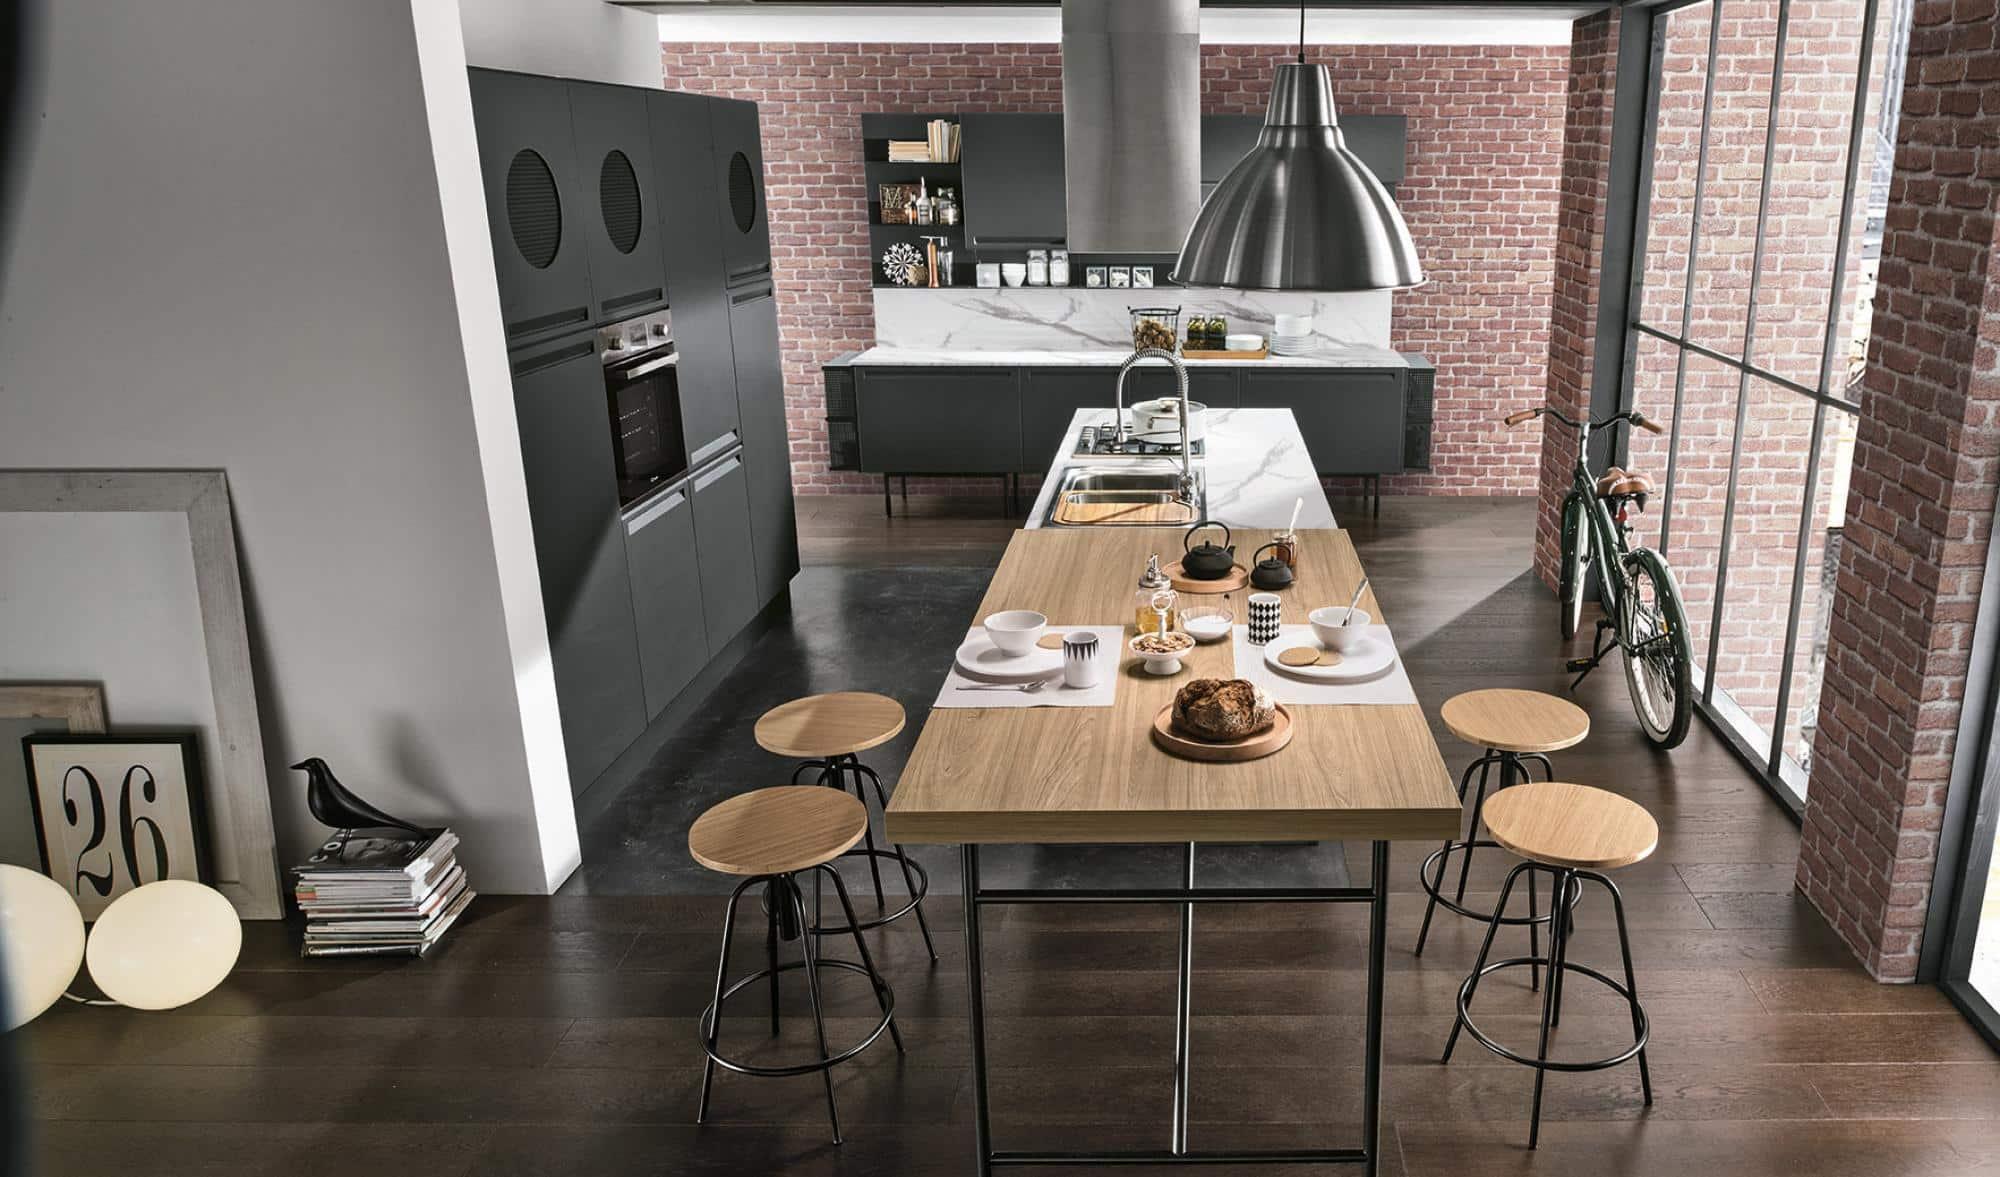 Isla κουζινα πολυμερικο με ενσωματωμενη λαβη και ρετρο υφος λεπτομερειες